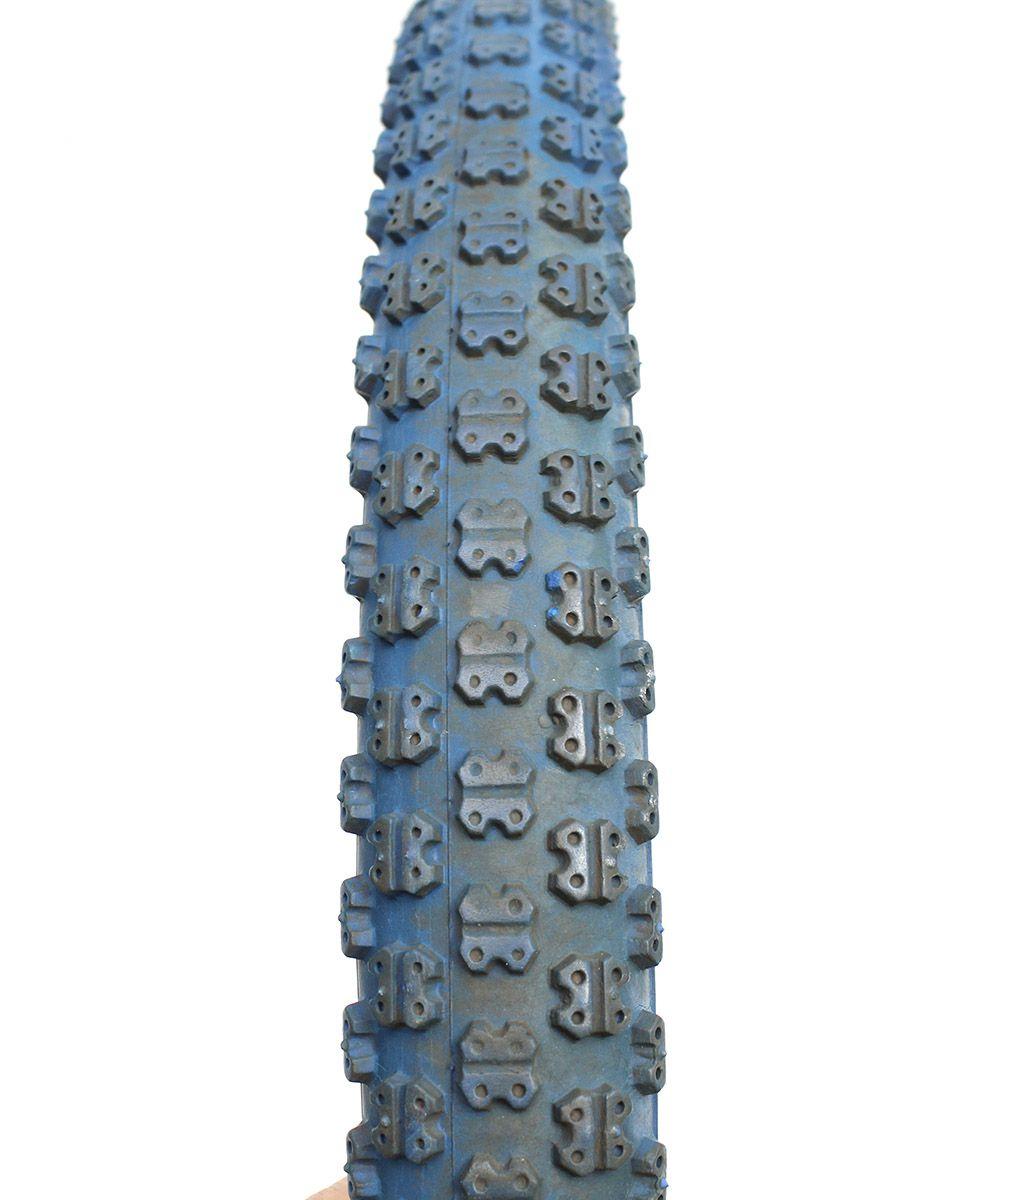 Pneu Aro 20 Pirelli cross 20x175 arame